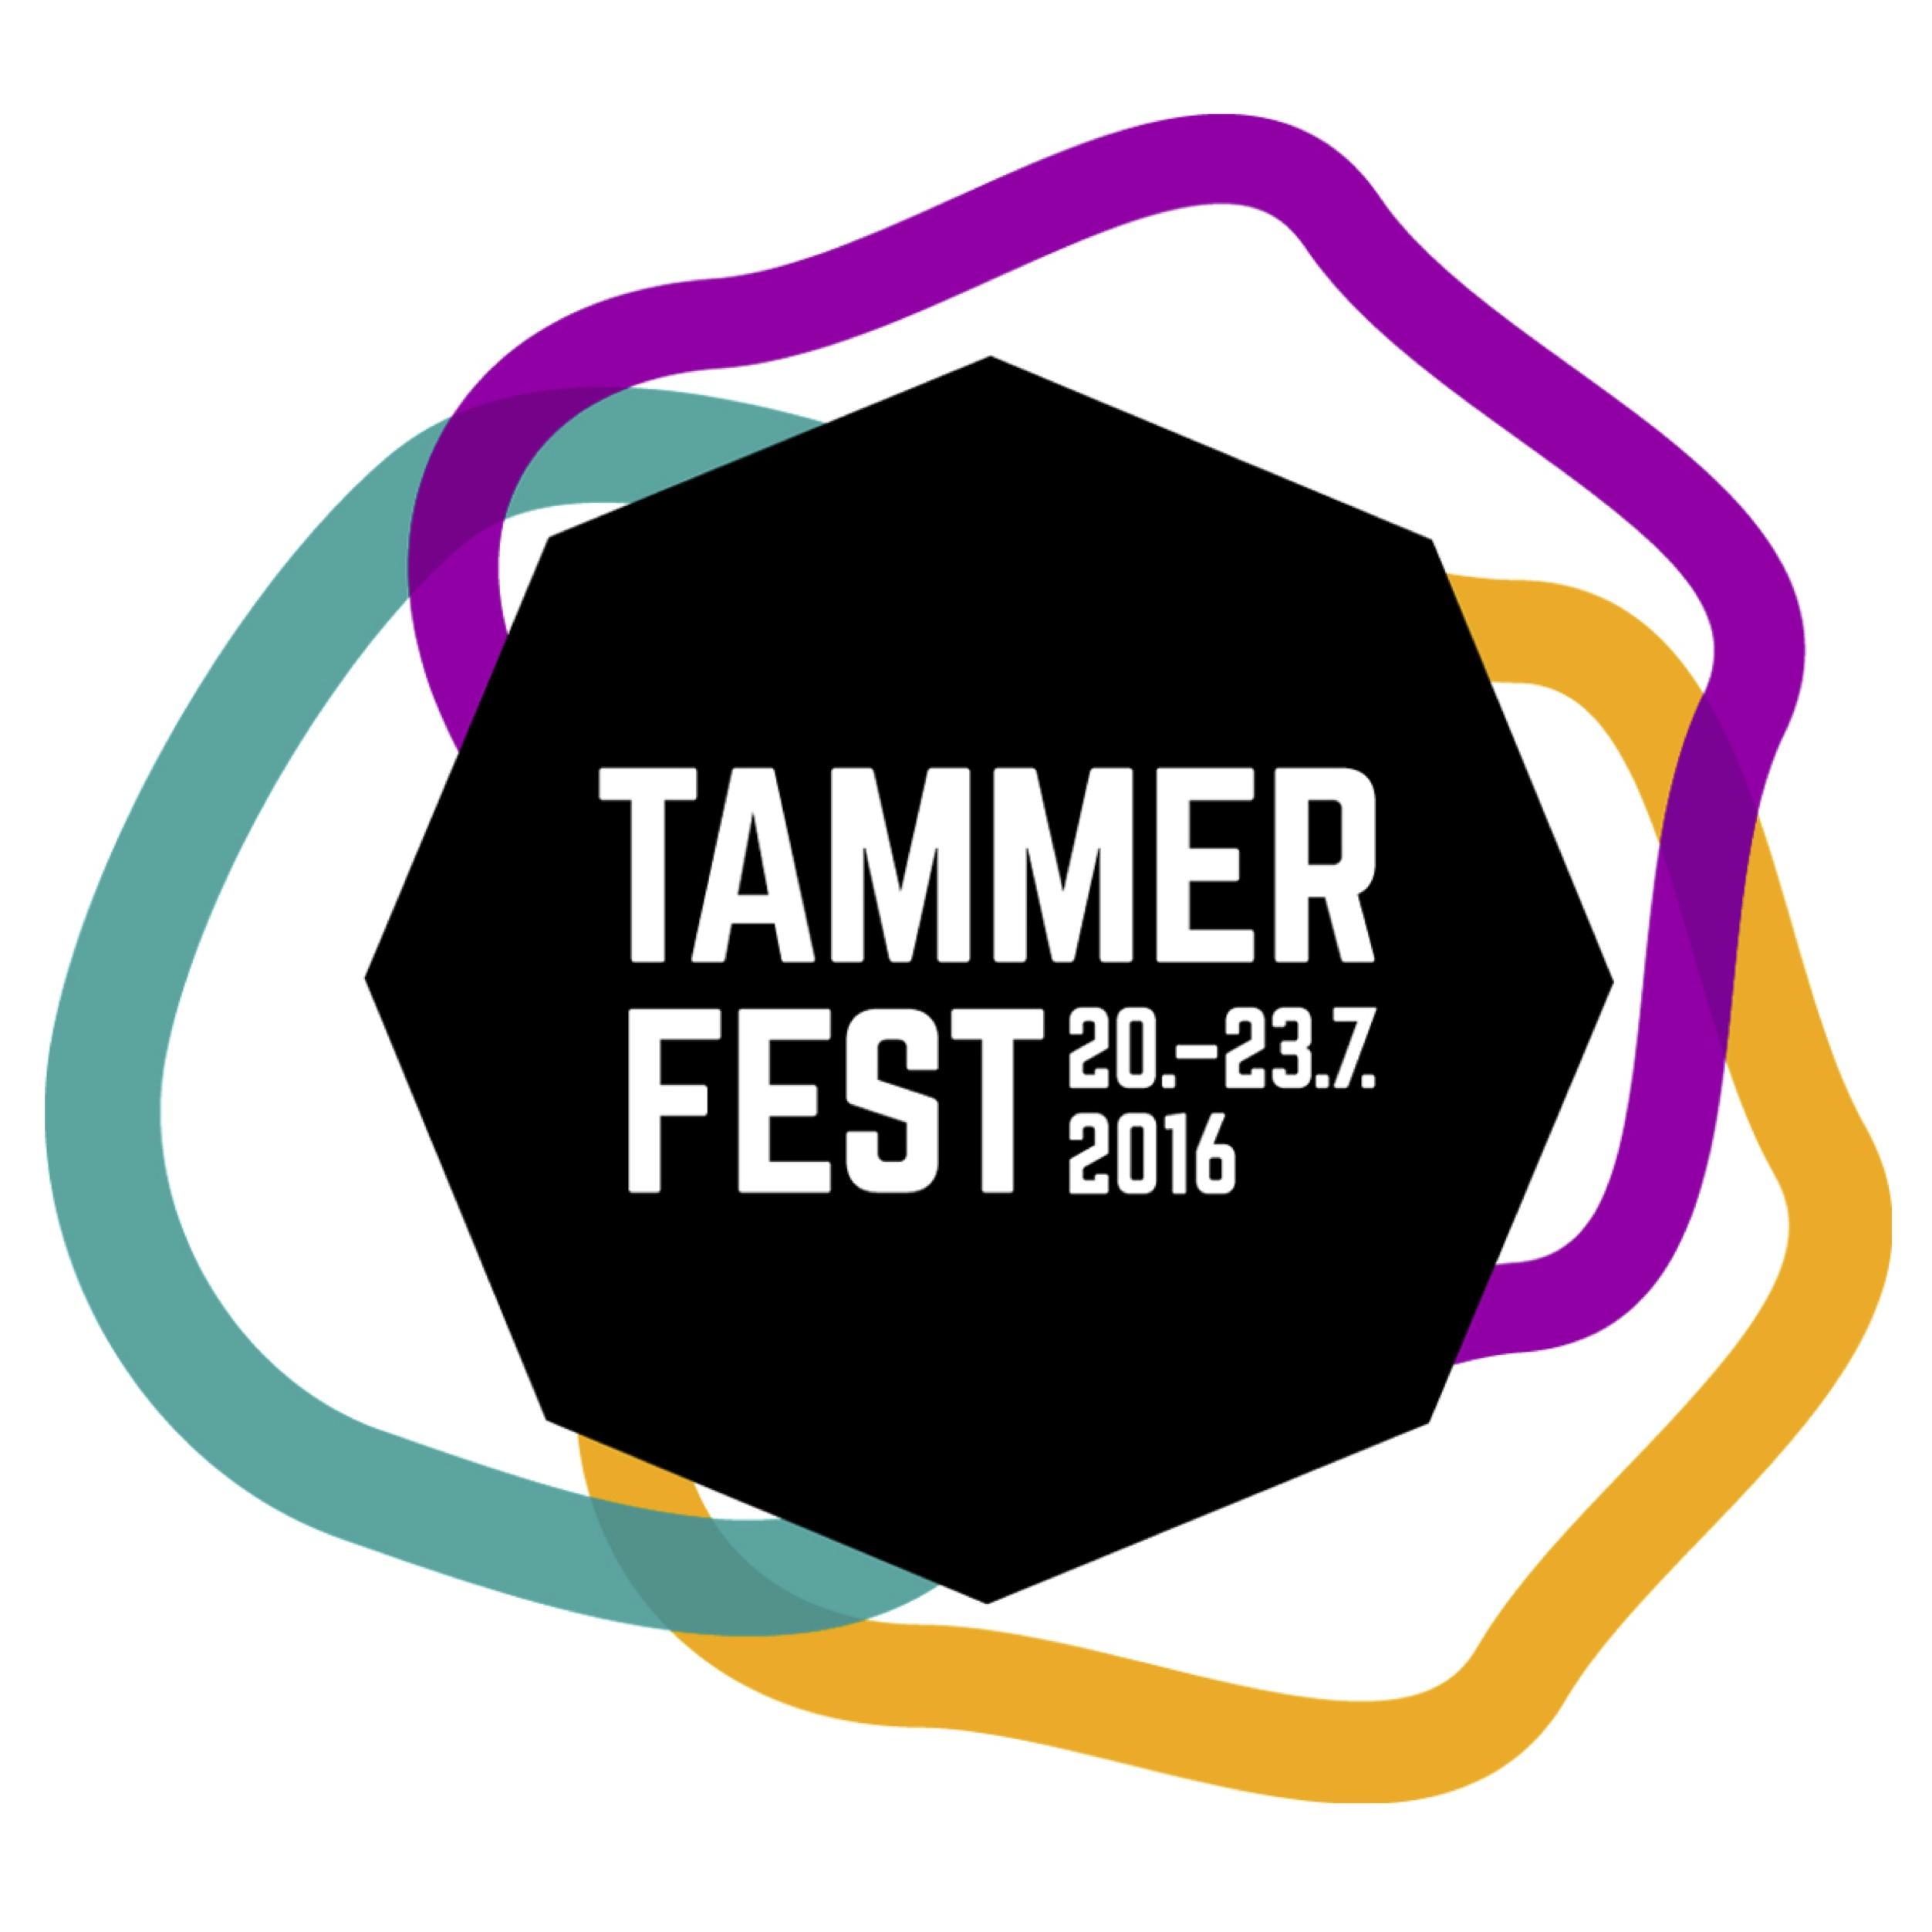 Tammerfest 2016 & lippuarvonta Tammerfest Extraan!